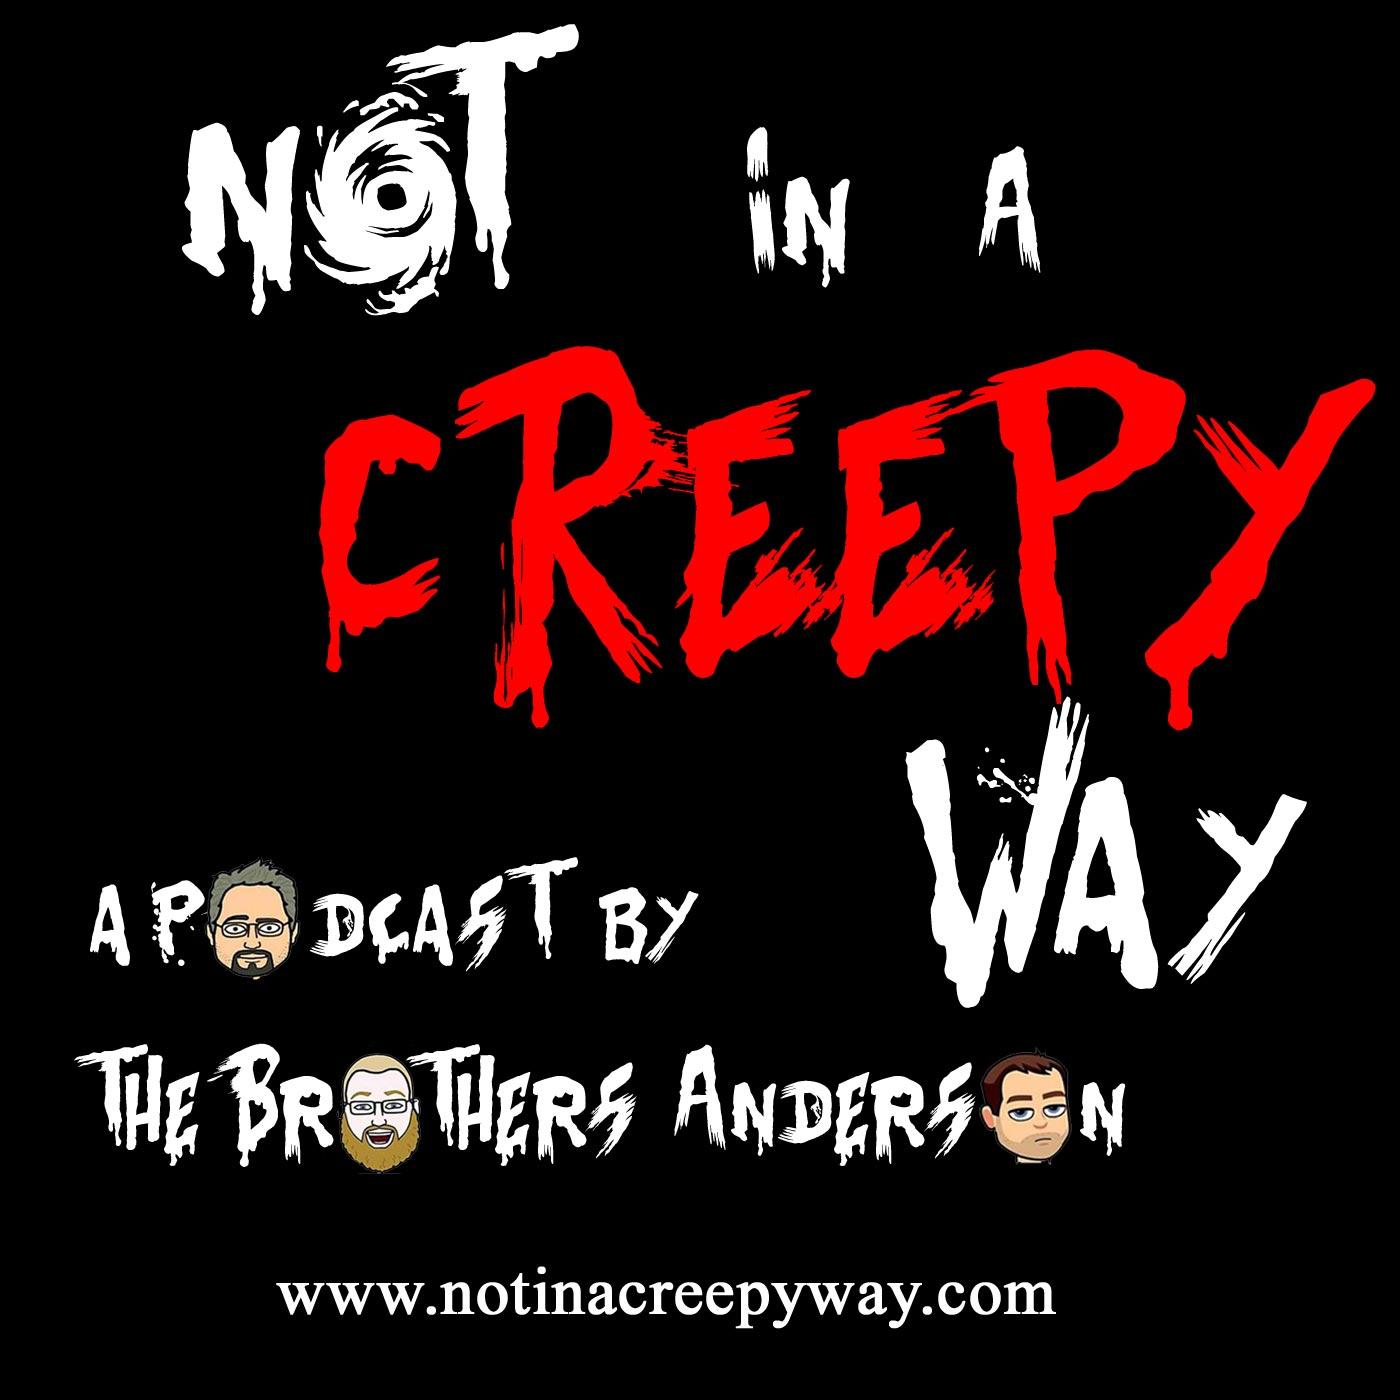 Not In a Creepy Way logo